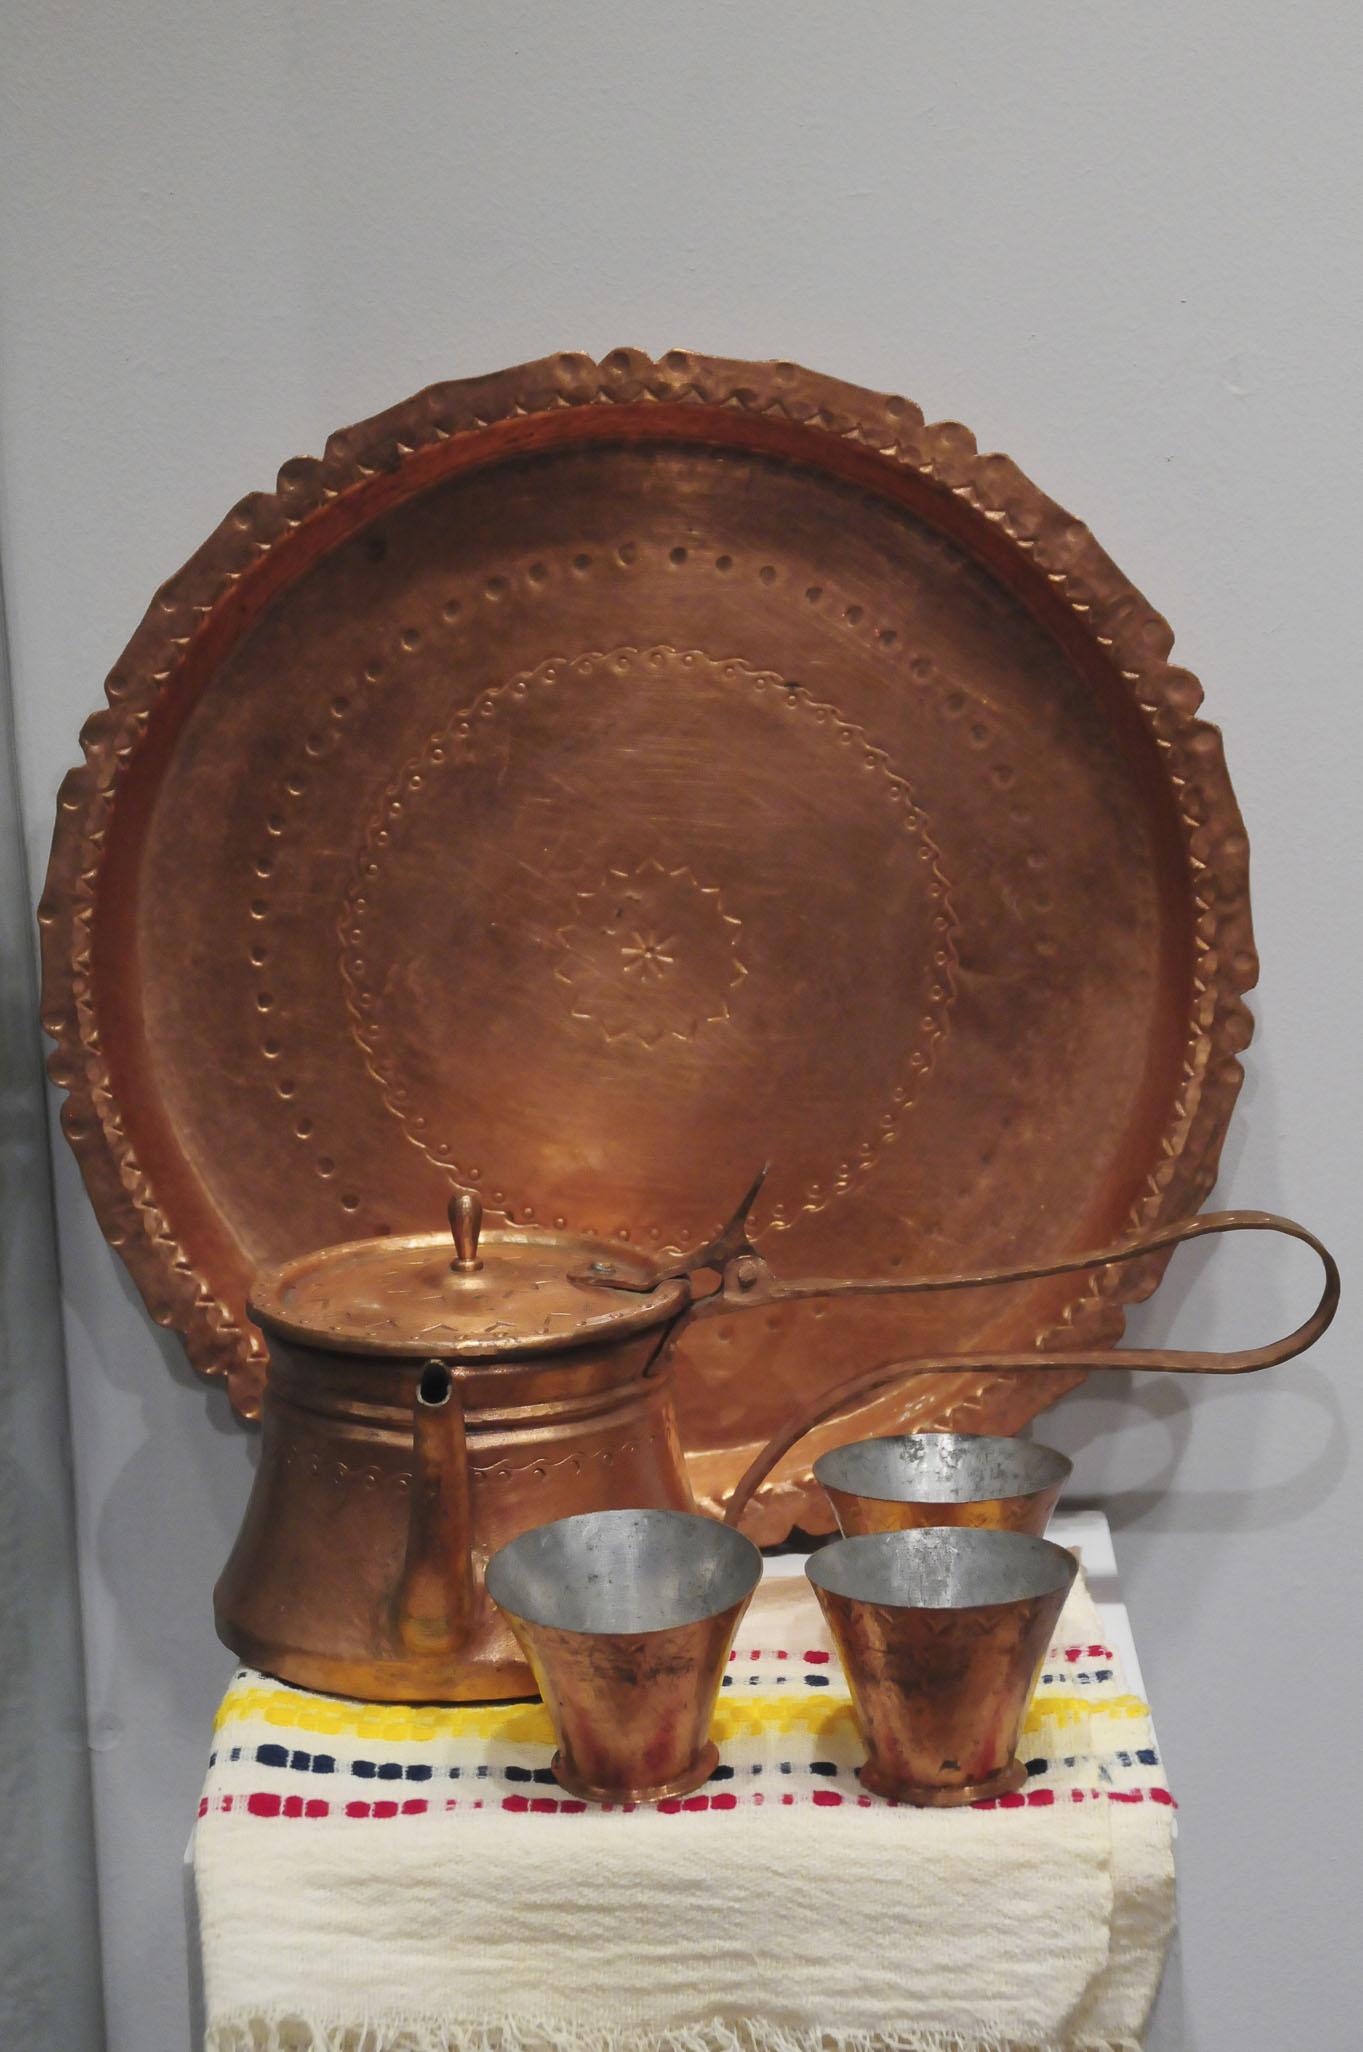 troyan-museum-mednikarstvo-ot-troyanskiq-krai-25